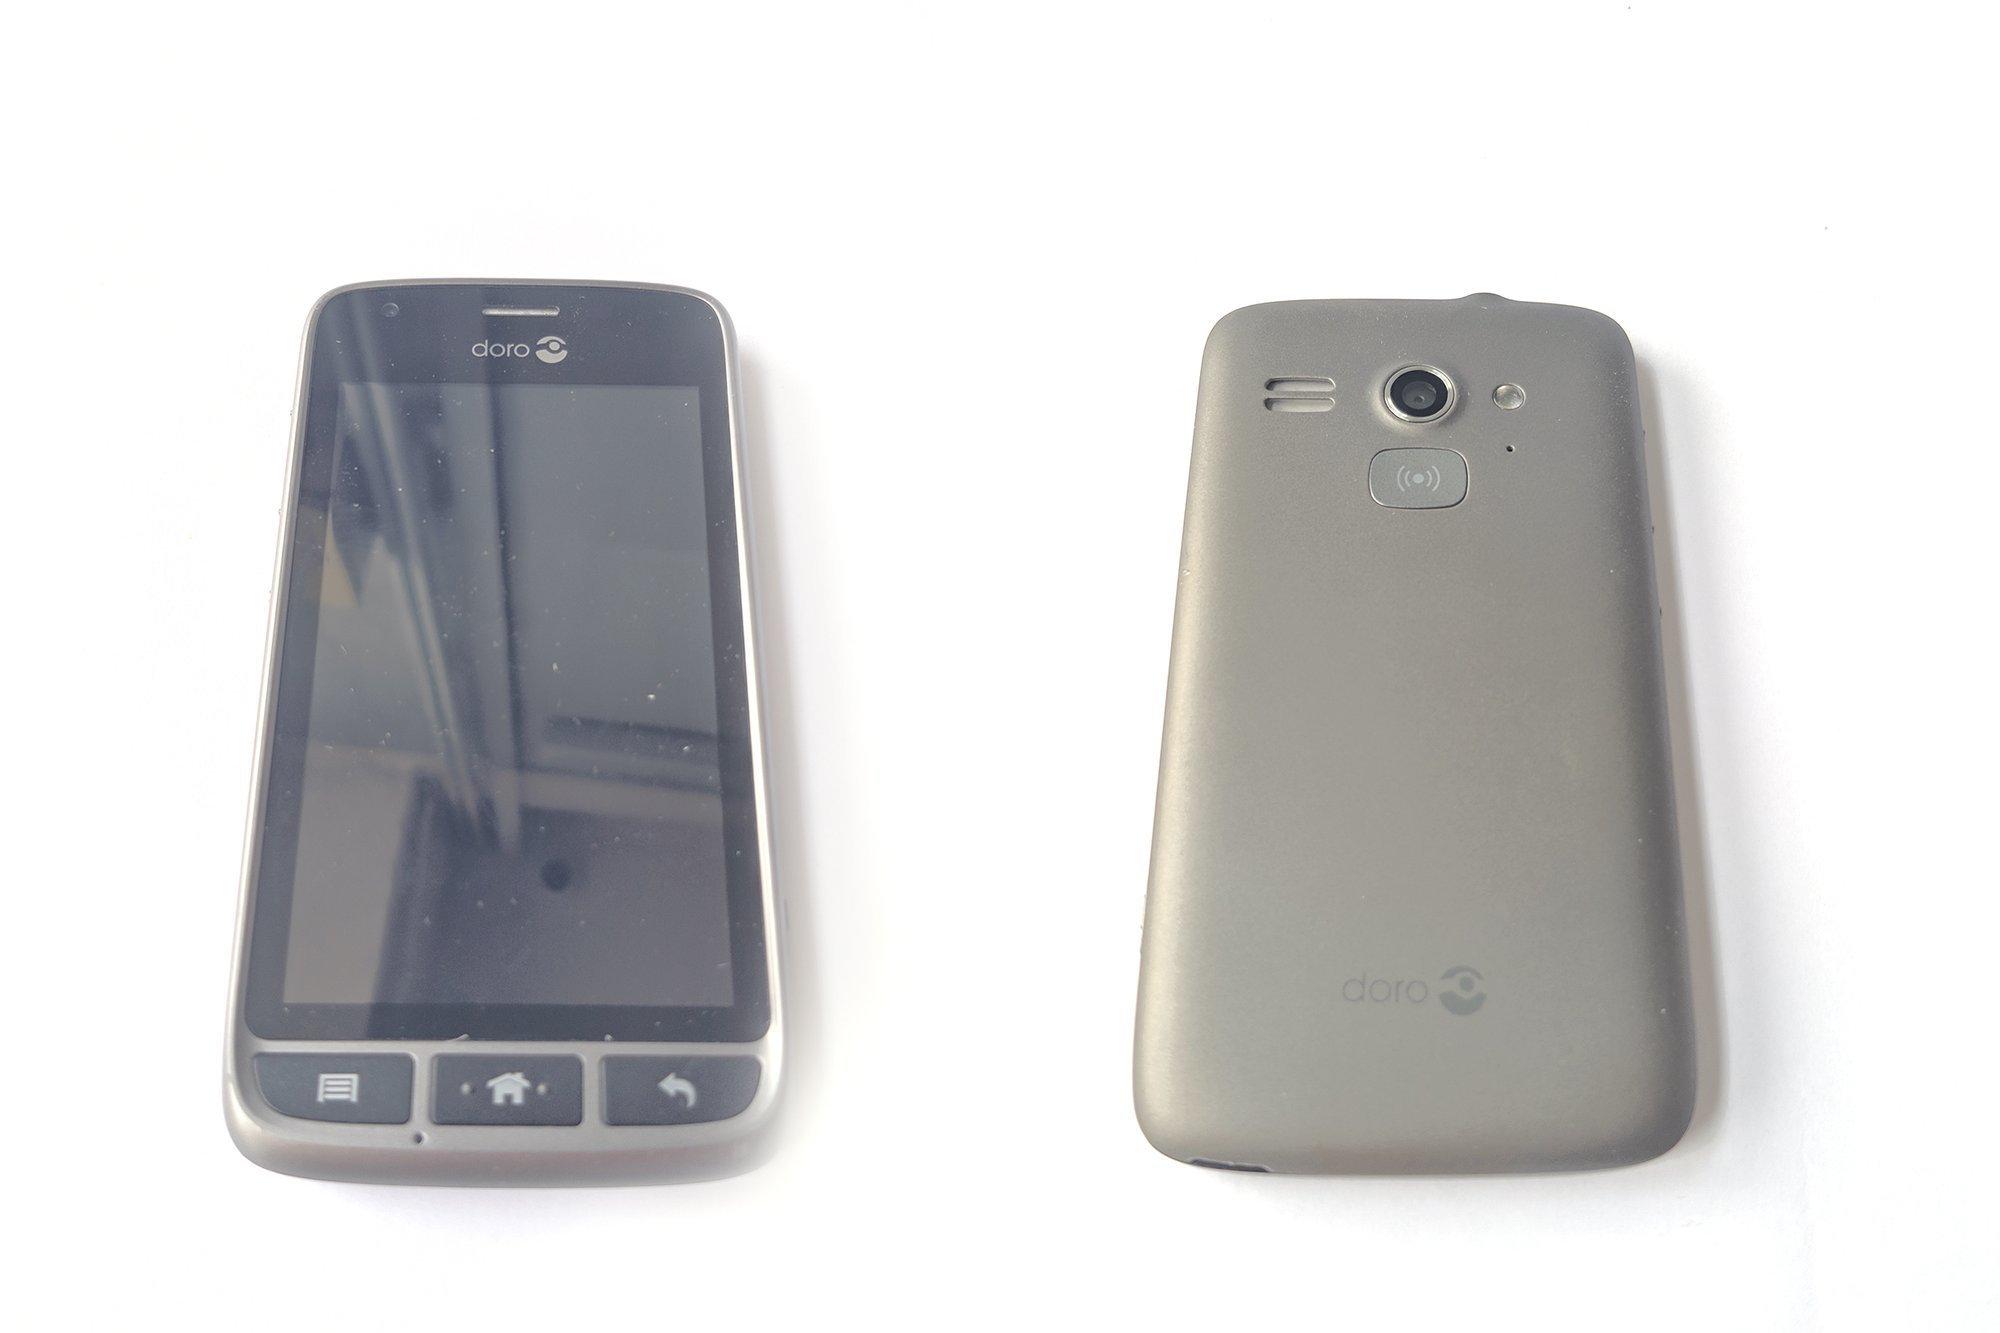 Smartphone Doro Liberto 820 mini Steel Black DSB-0010 Damaged / Faulty